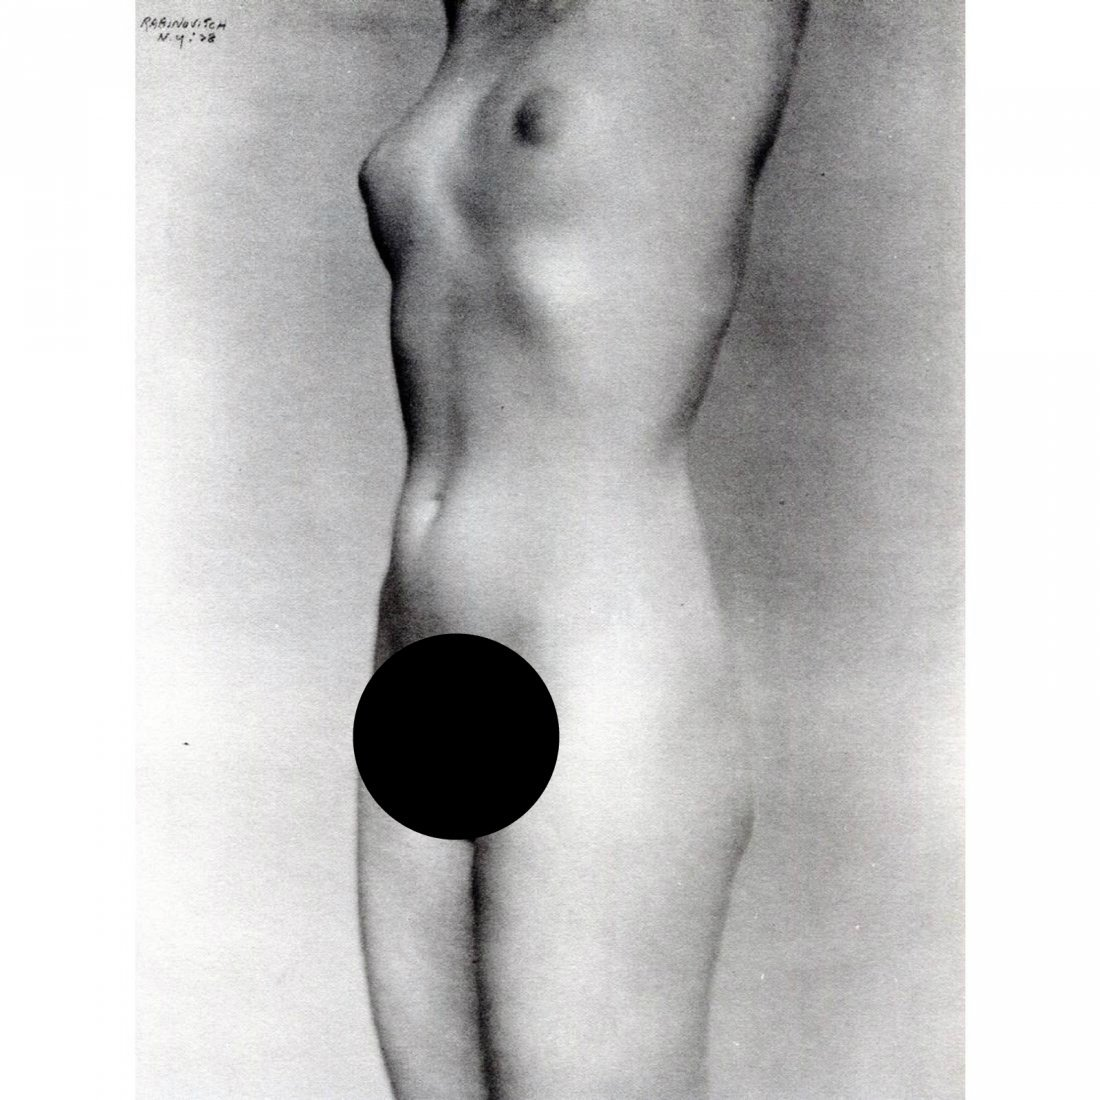 RABINOVITCH - Nude Torso - 2